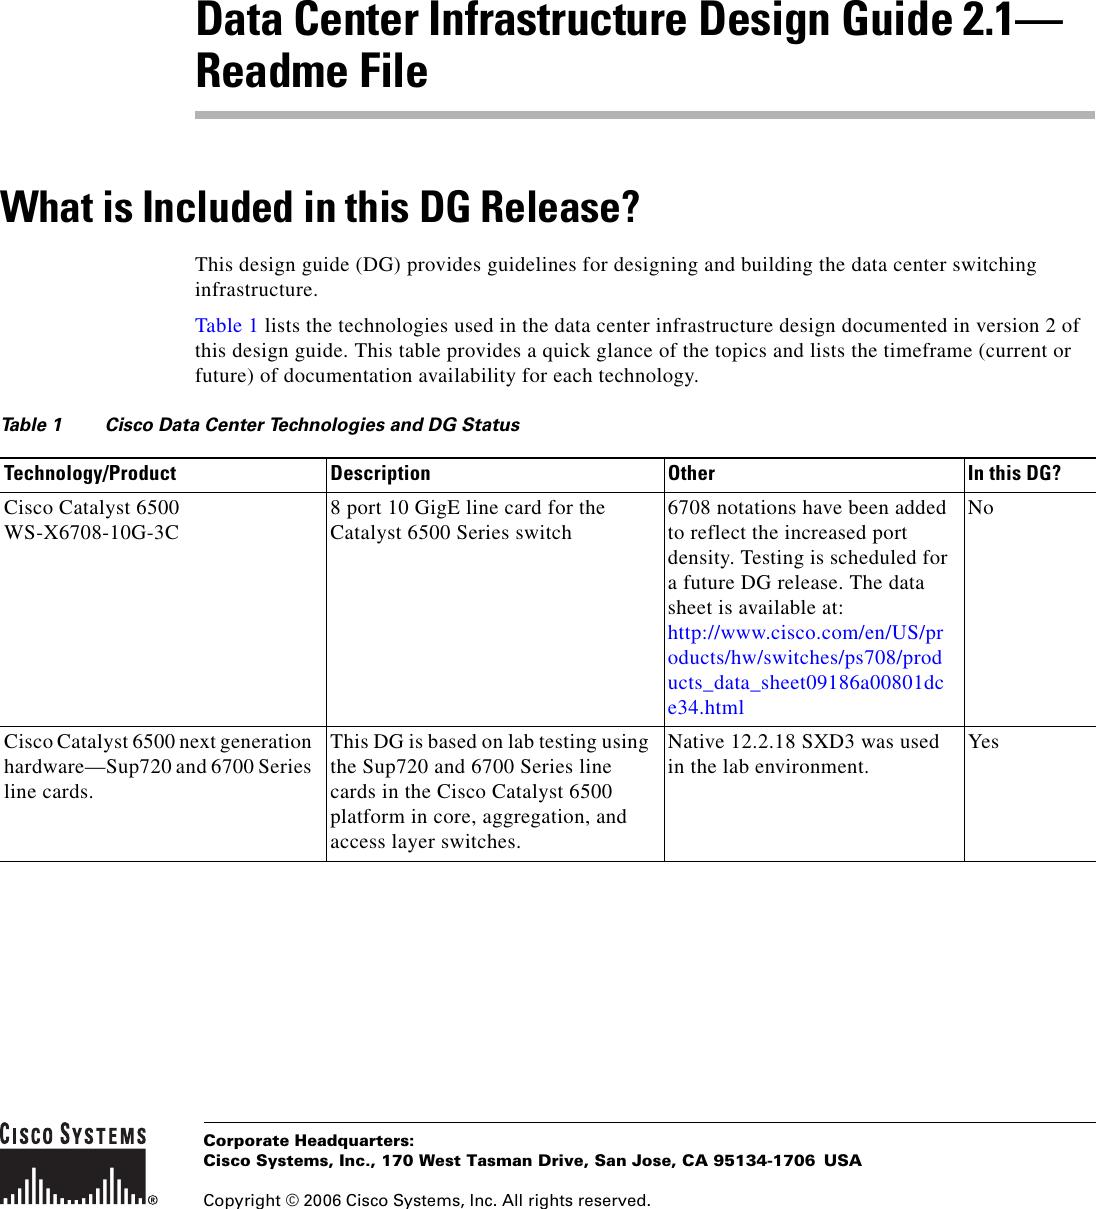 Cisco Systems Ol 11568 01 Users Manual DCReadme_bk